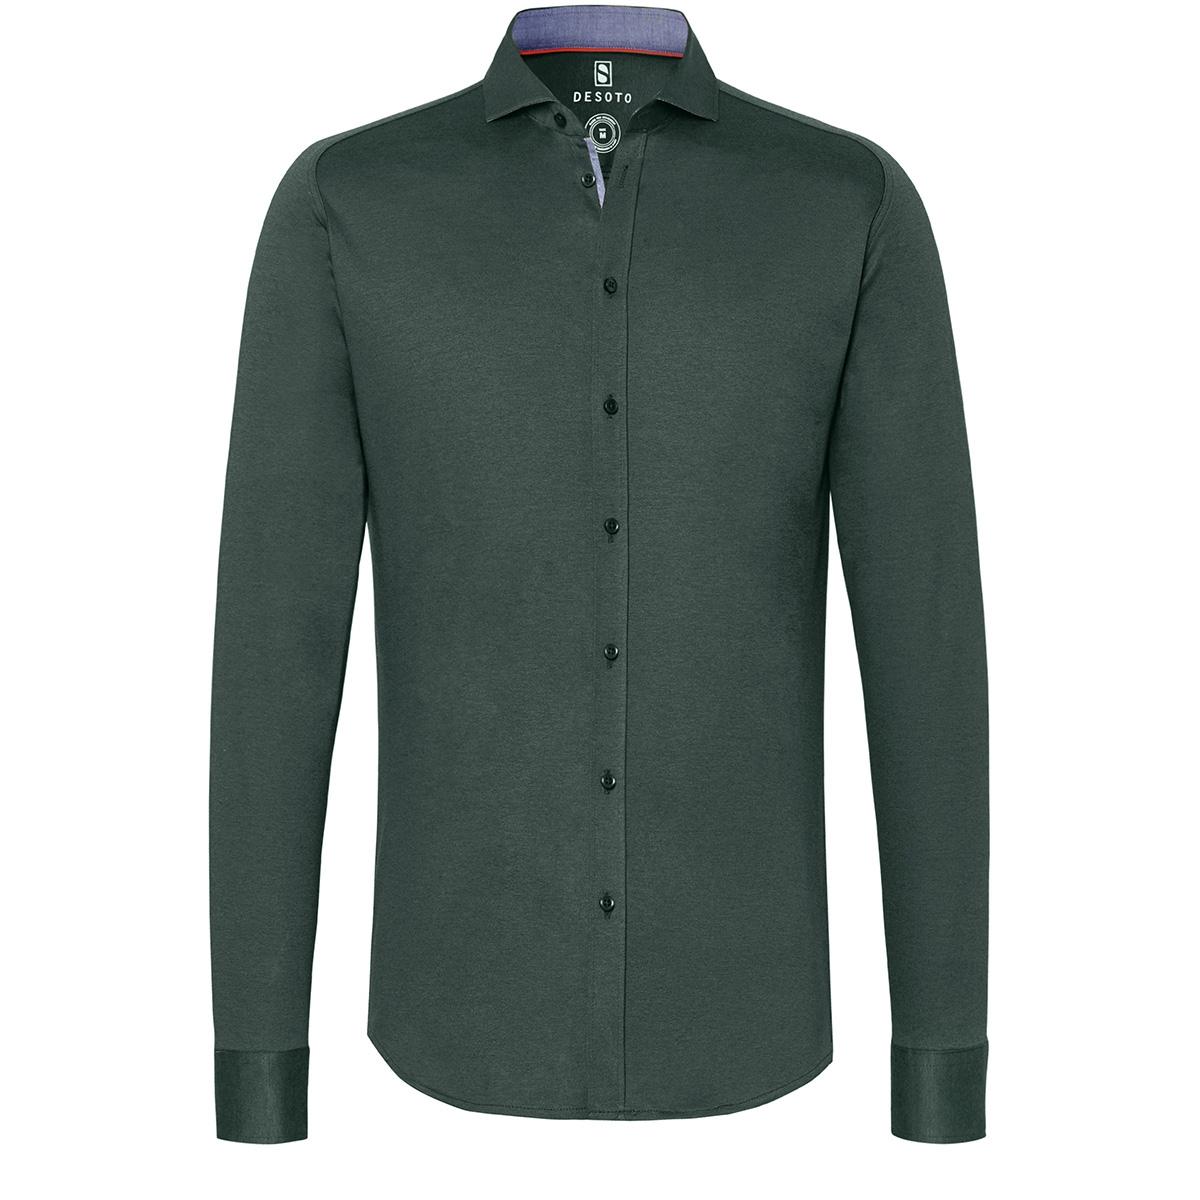 new hai 97007 3 desoto overhemd 602 green piquee